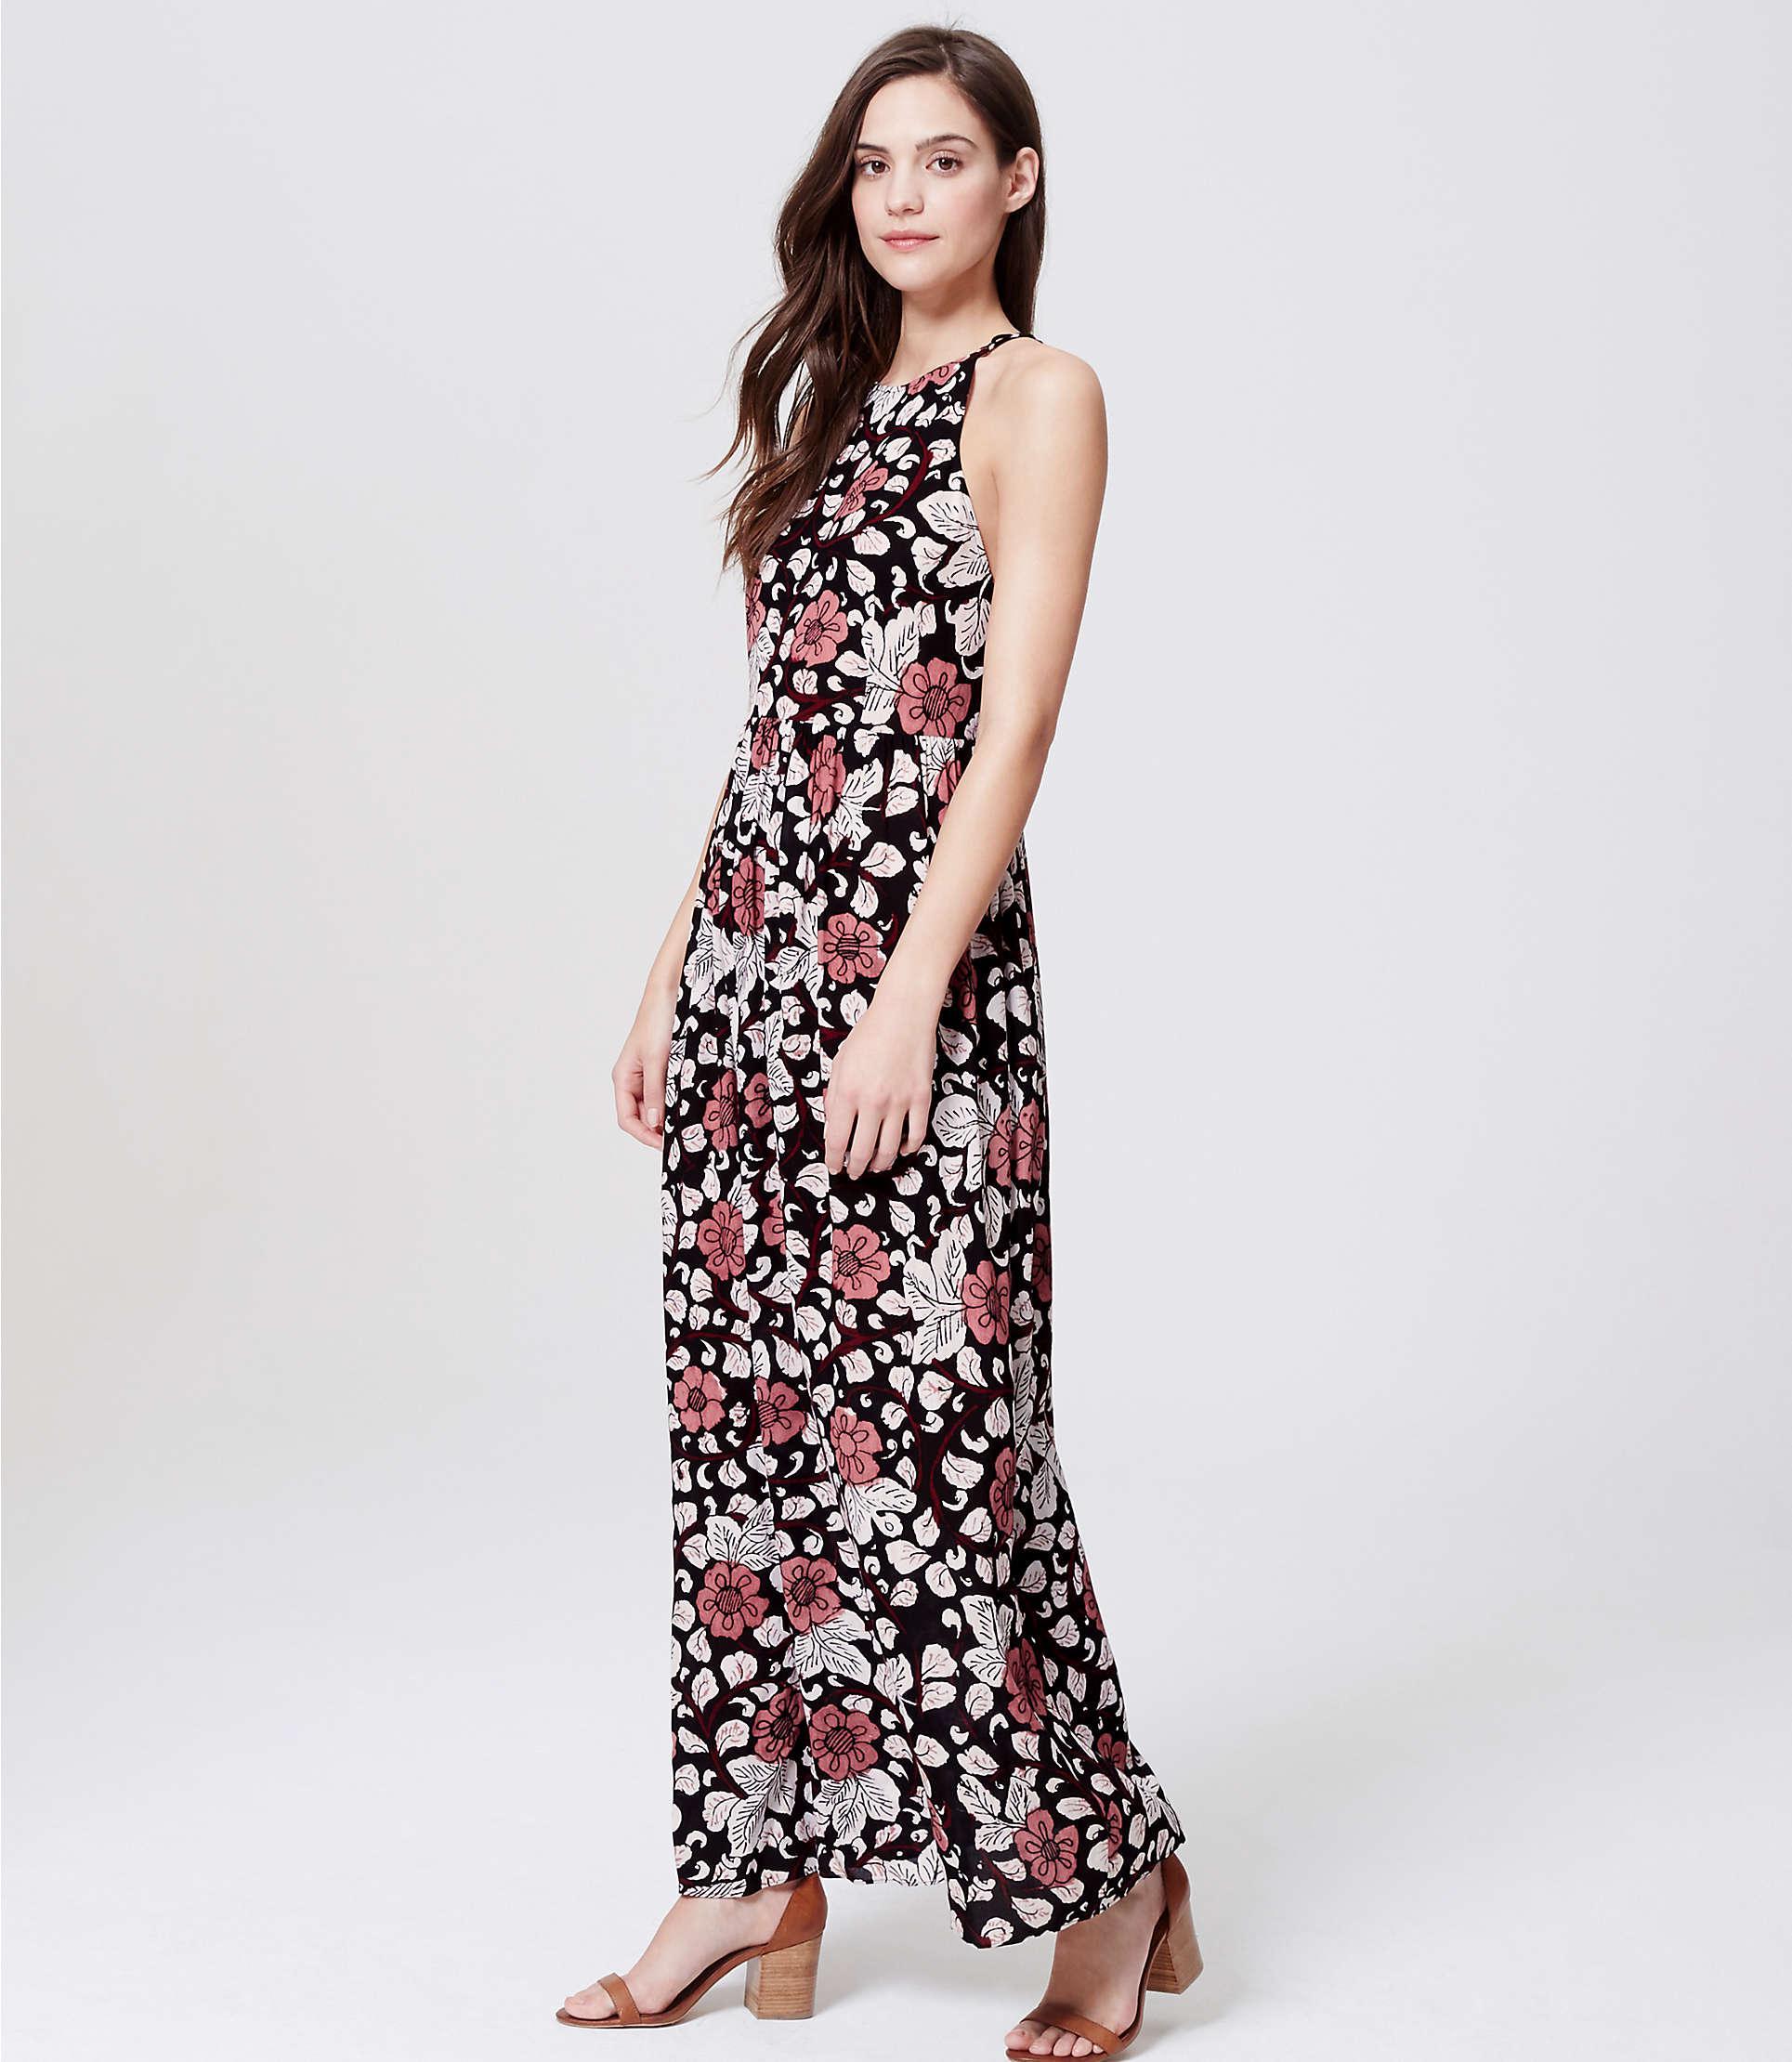 96fa1905606 LOFT Petite Beach Rainforest Floral Strappy Maxi Dress in Black - Lyst